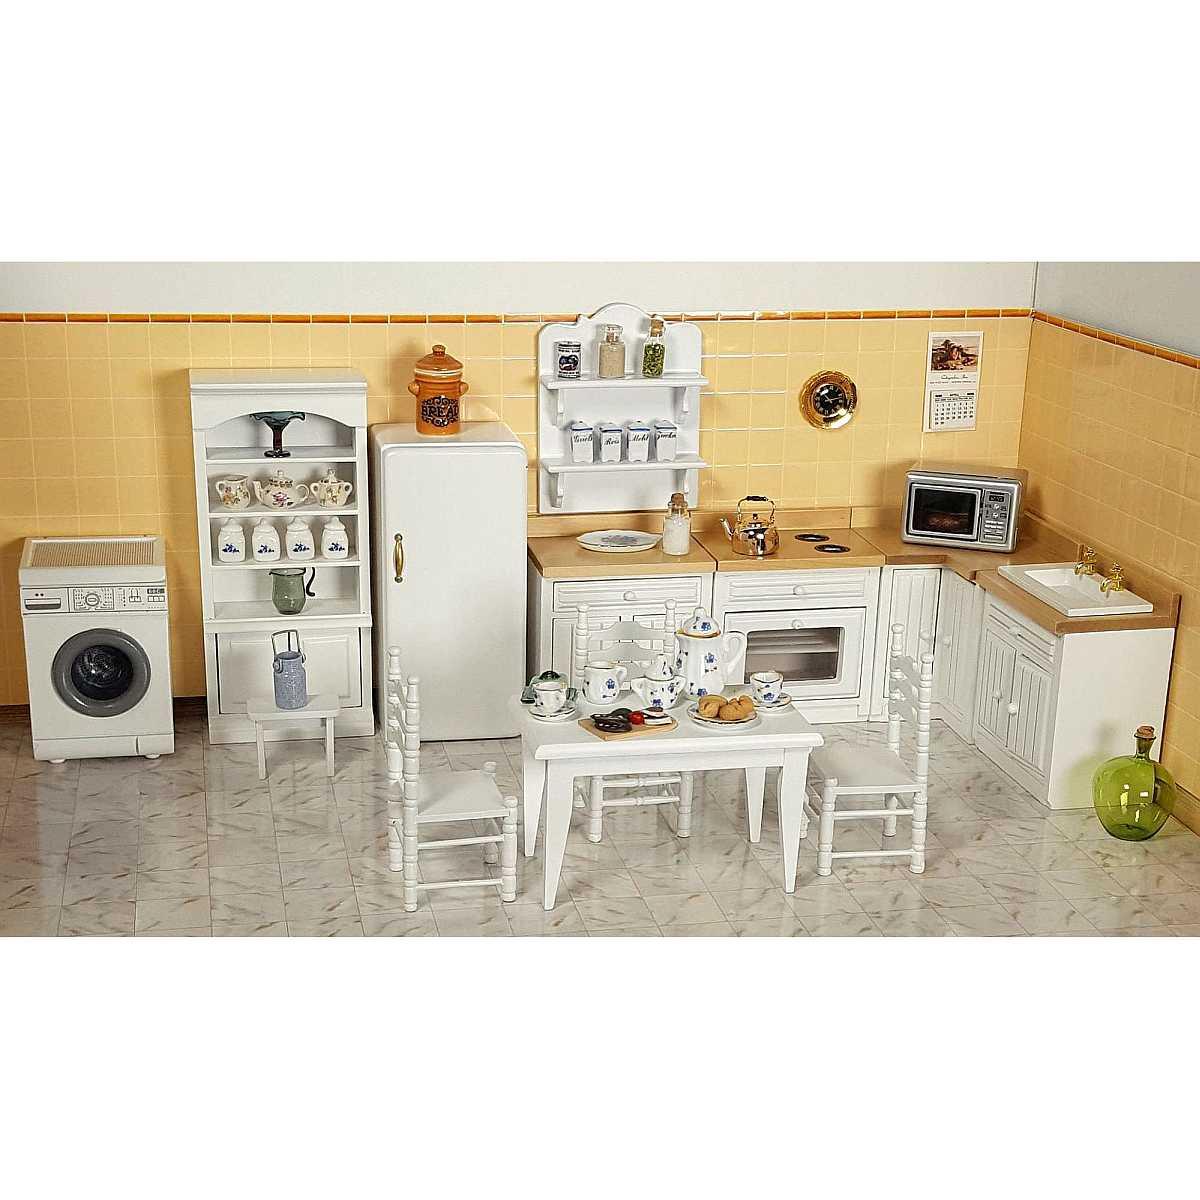 Fertigmöbel-Set - Moderne Küche